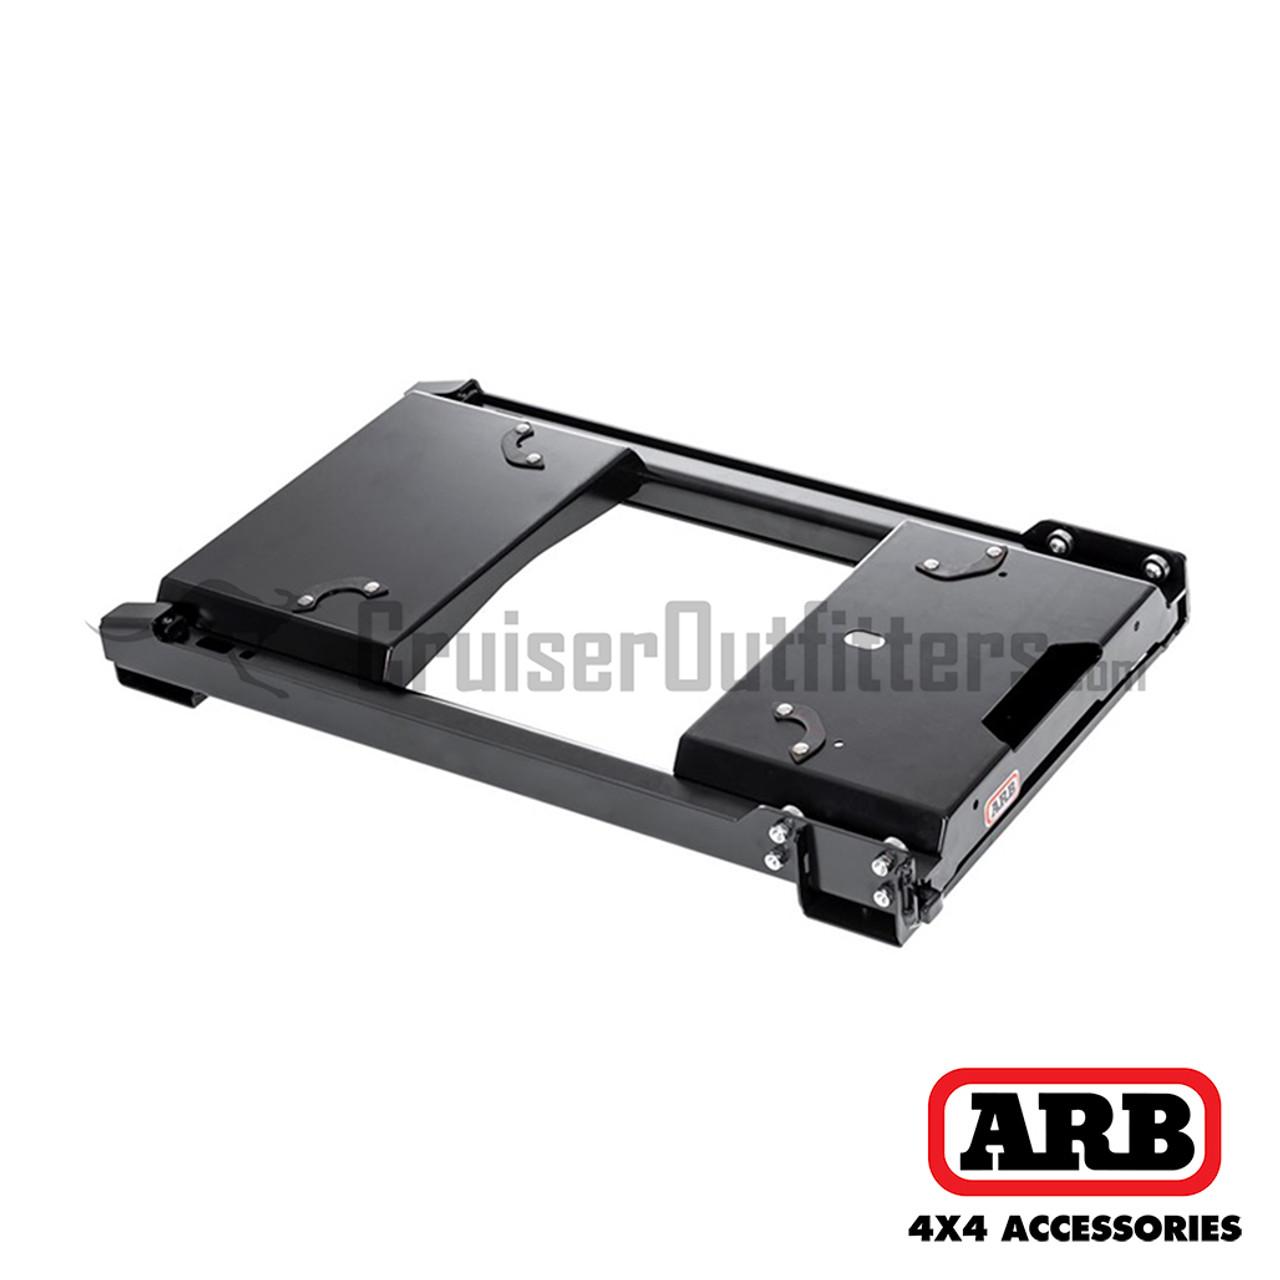 ARB Zero Fridge Slide 38QT & 47QT (ARB10900047)